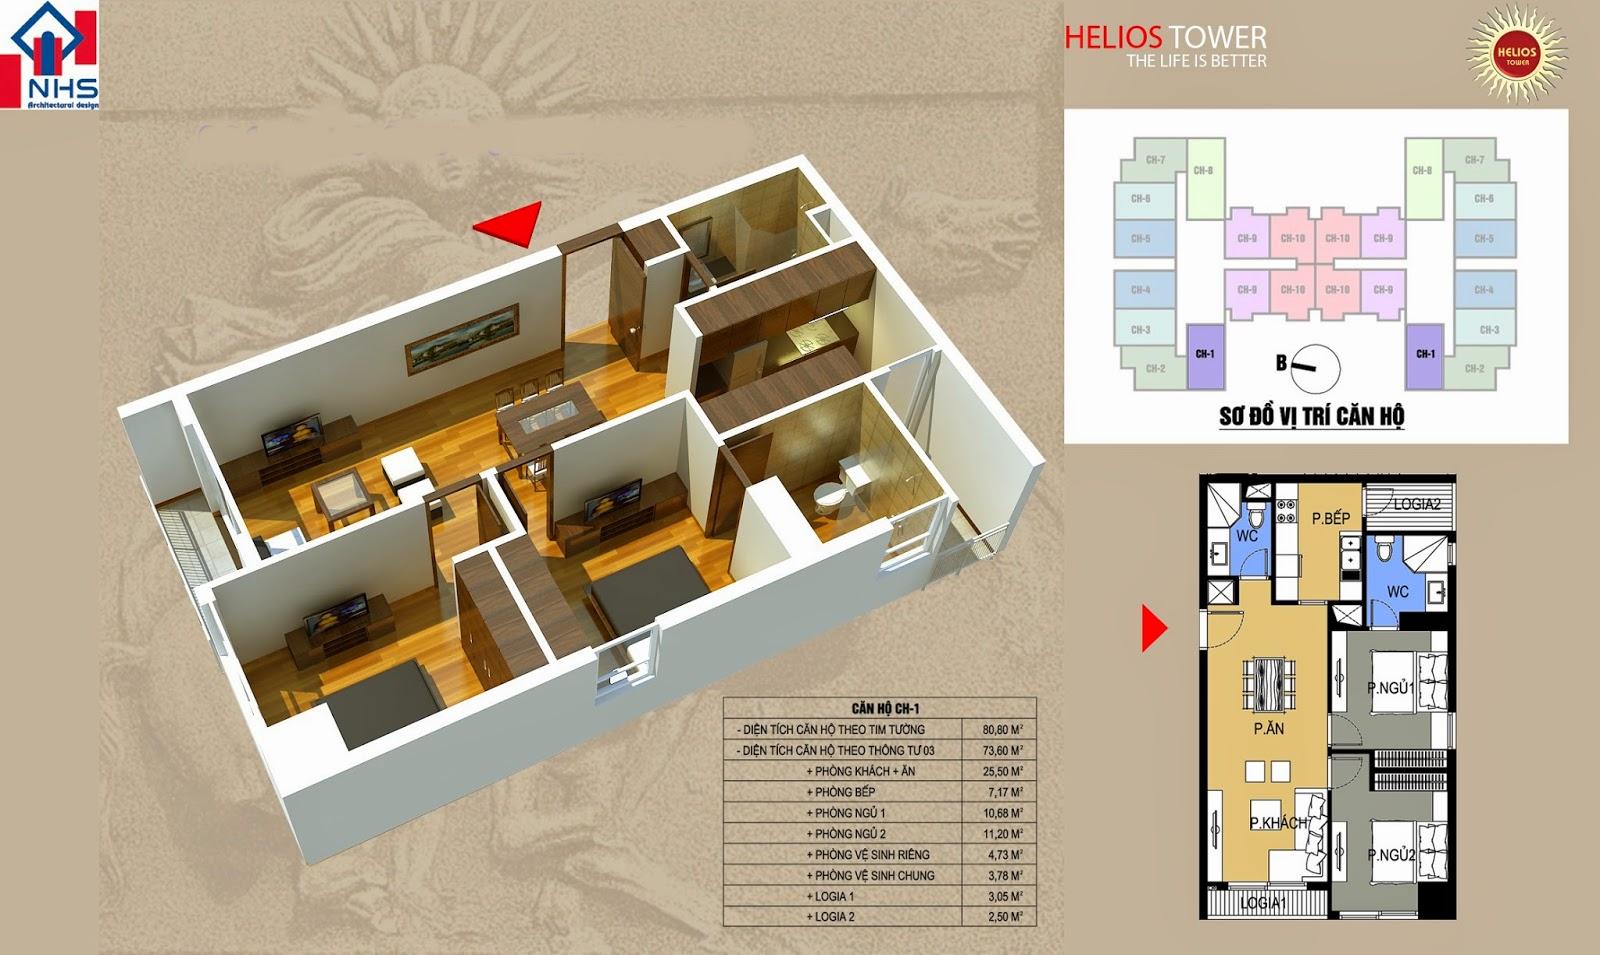 Căn 01 Helios Tower 75 Tam Trinh